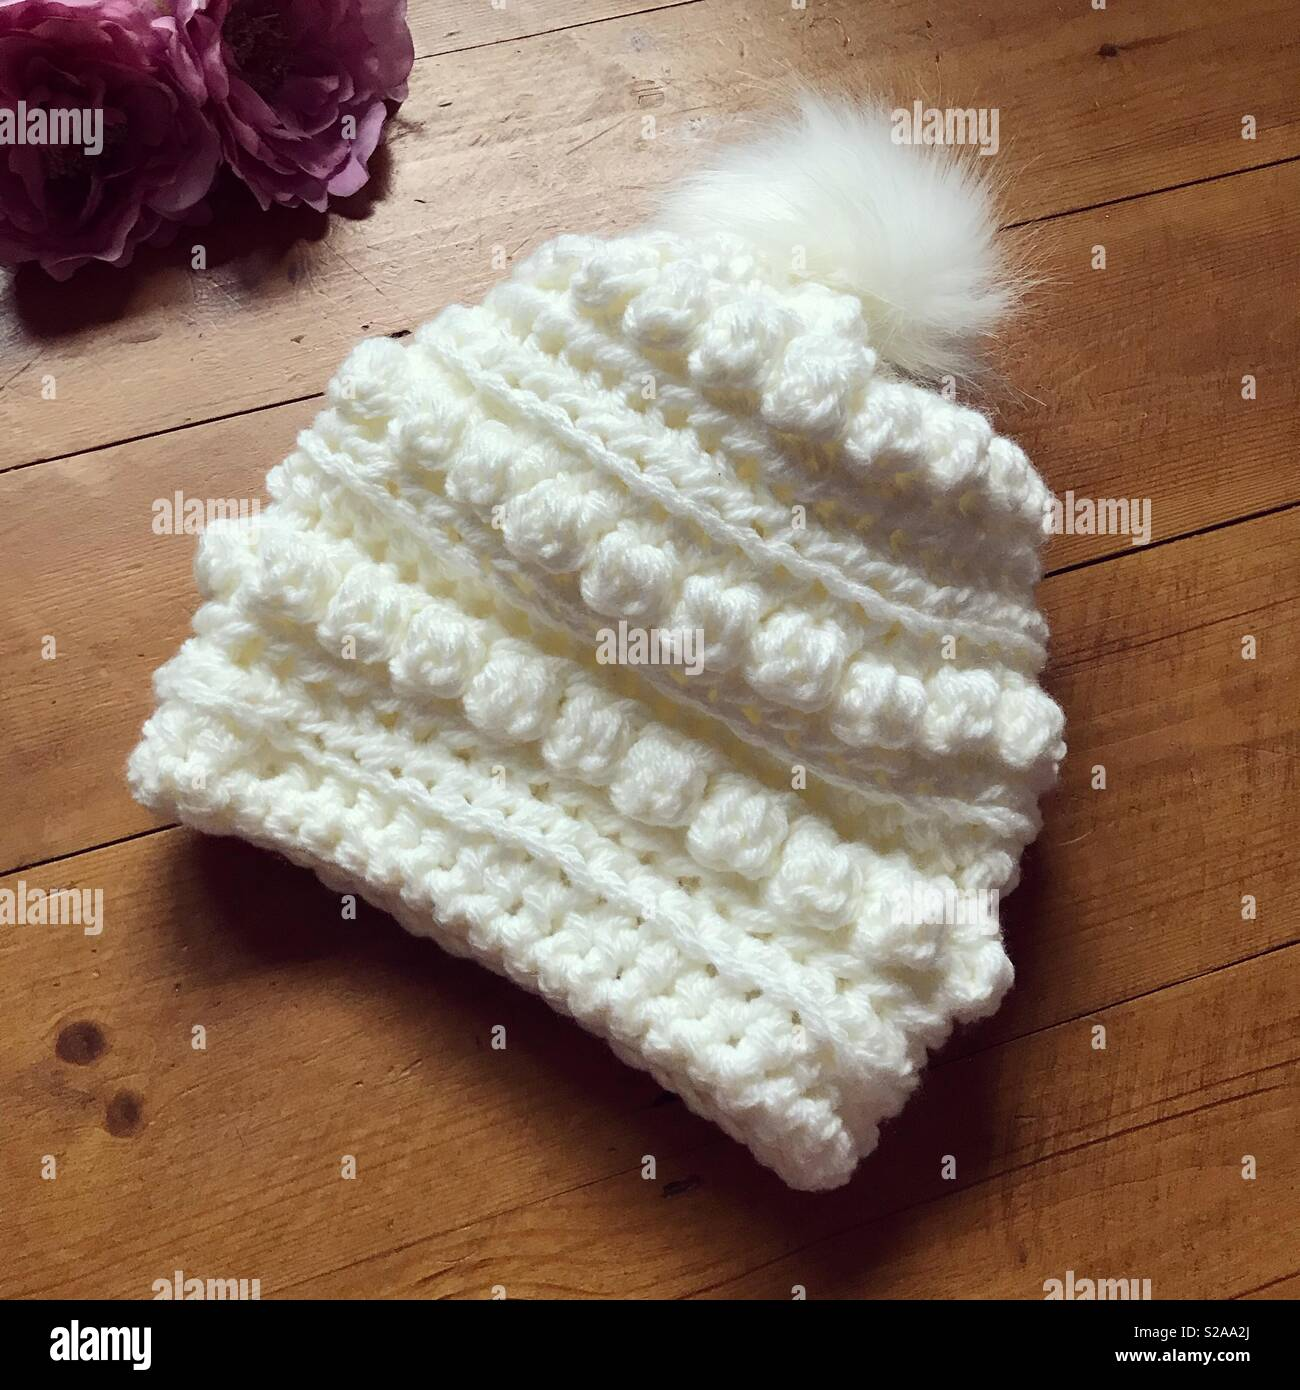 db0125c2 Crochet, crocheting, crochet hat, handmade, wool, crocheted, Pom Pom,  bobble hat